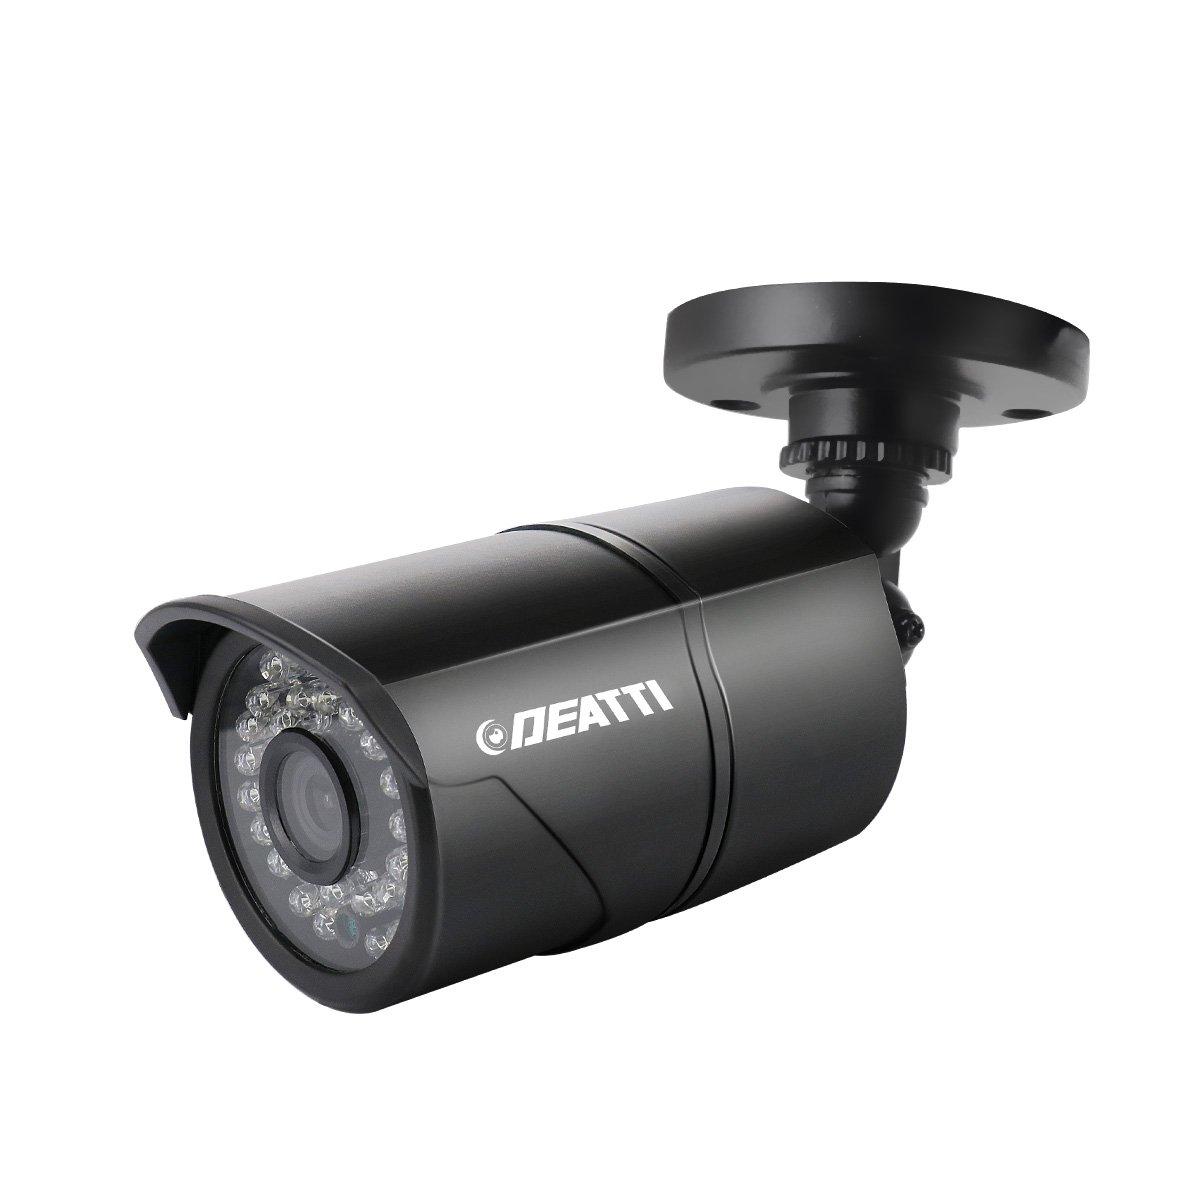 Deatti AHD Security Camera 2.0MP 1080P 2000TVL 36PCS IR-LEDs 3.6mm lens with IR Cut Day/Night Waterproof 4336302831